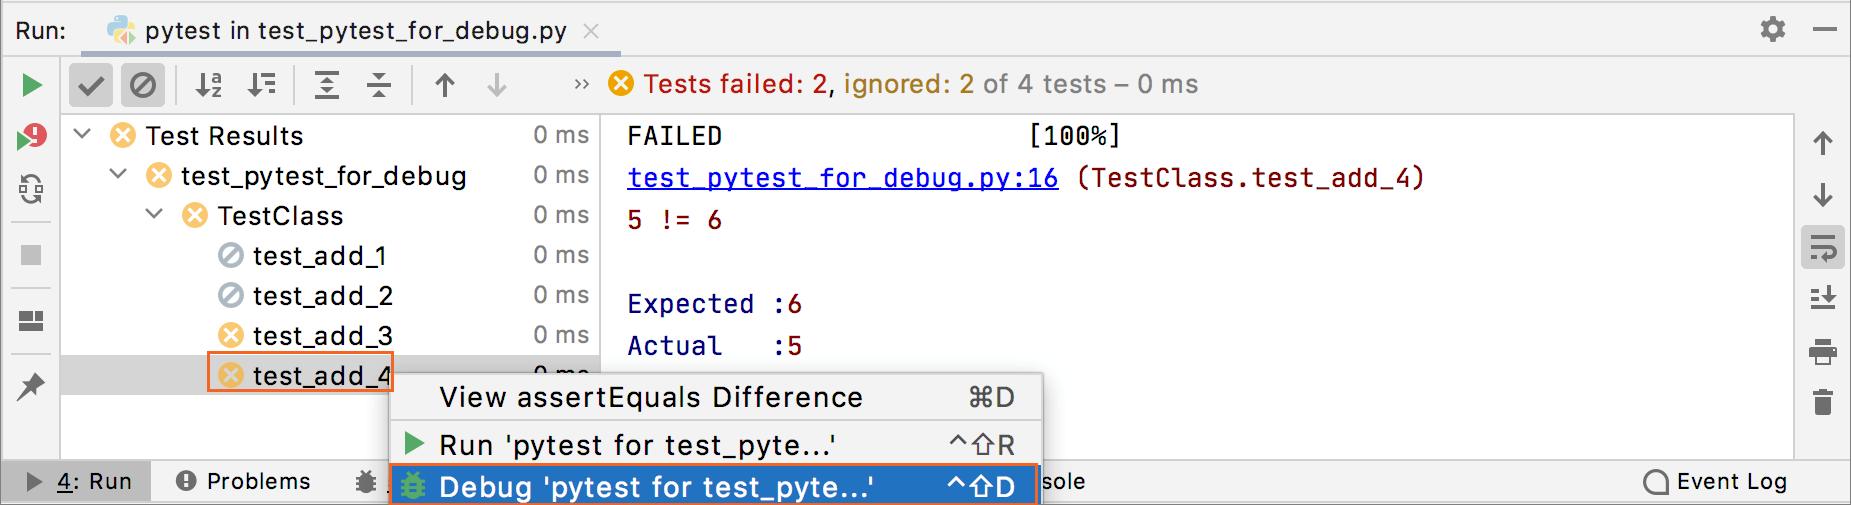 Select a failed test to debug